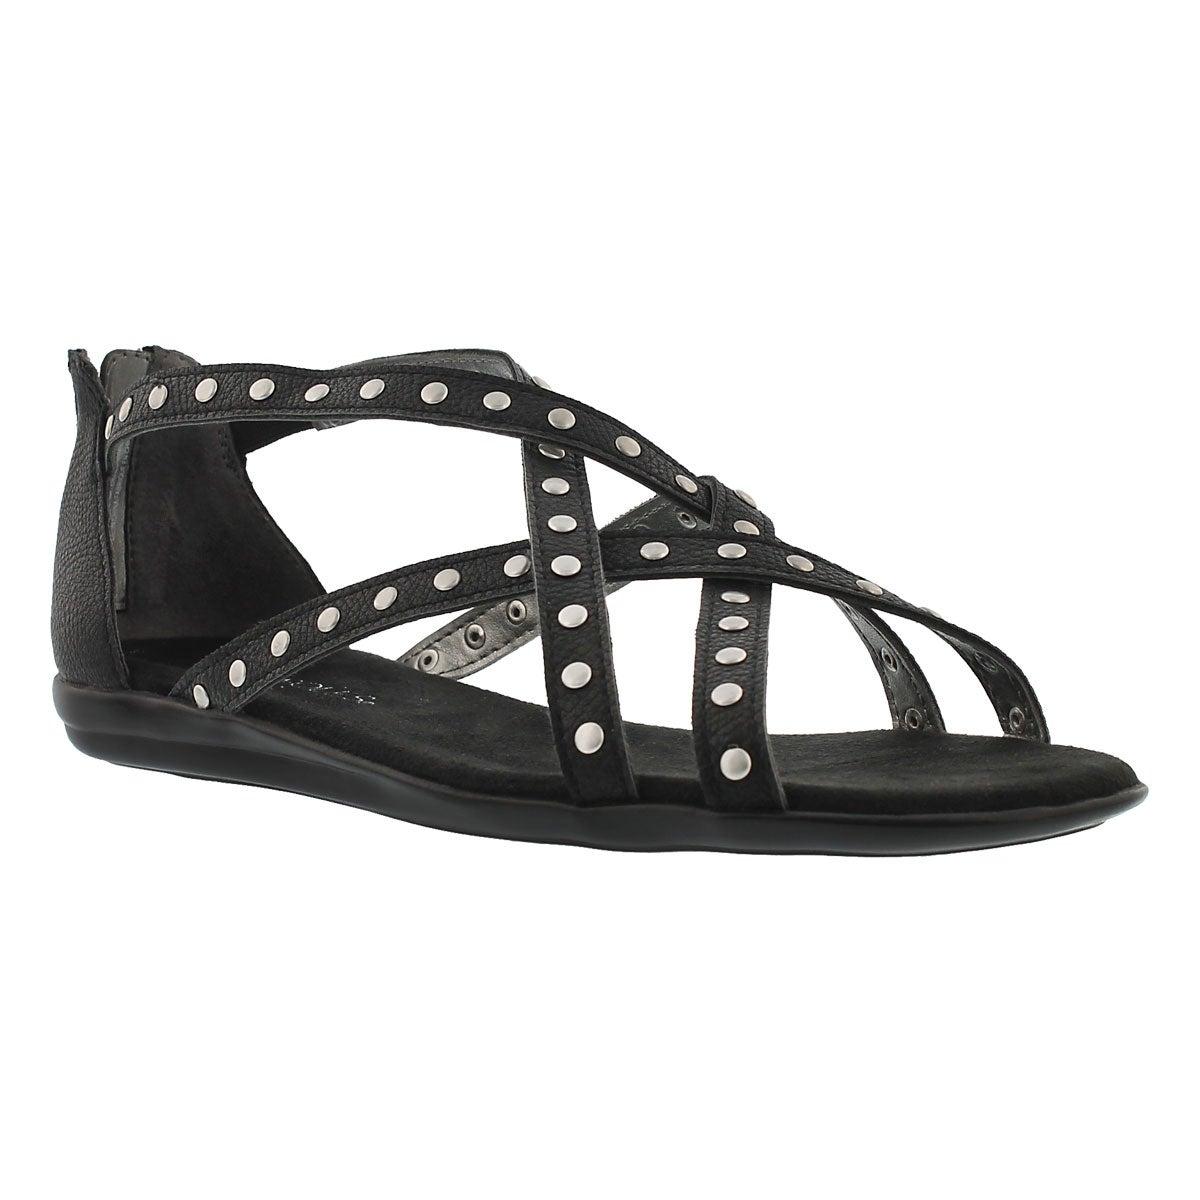 Lds Chlosing Time black gladiator sandal